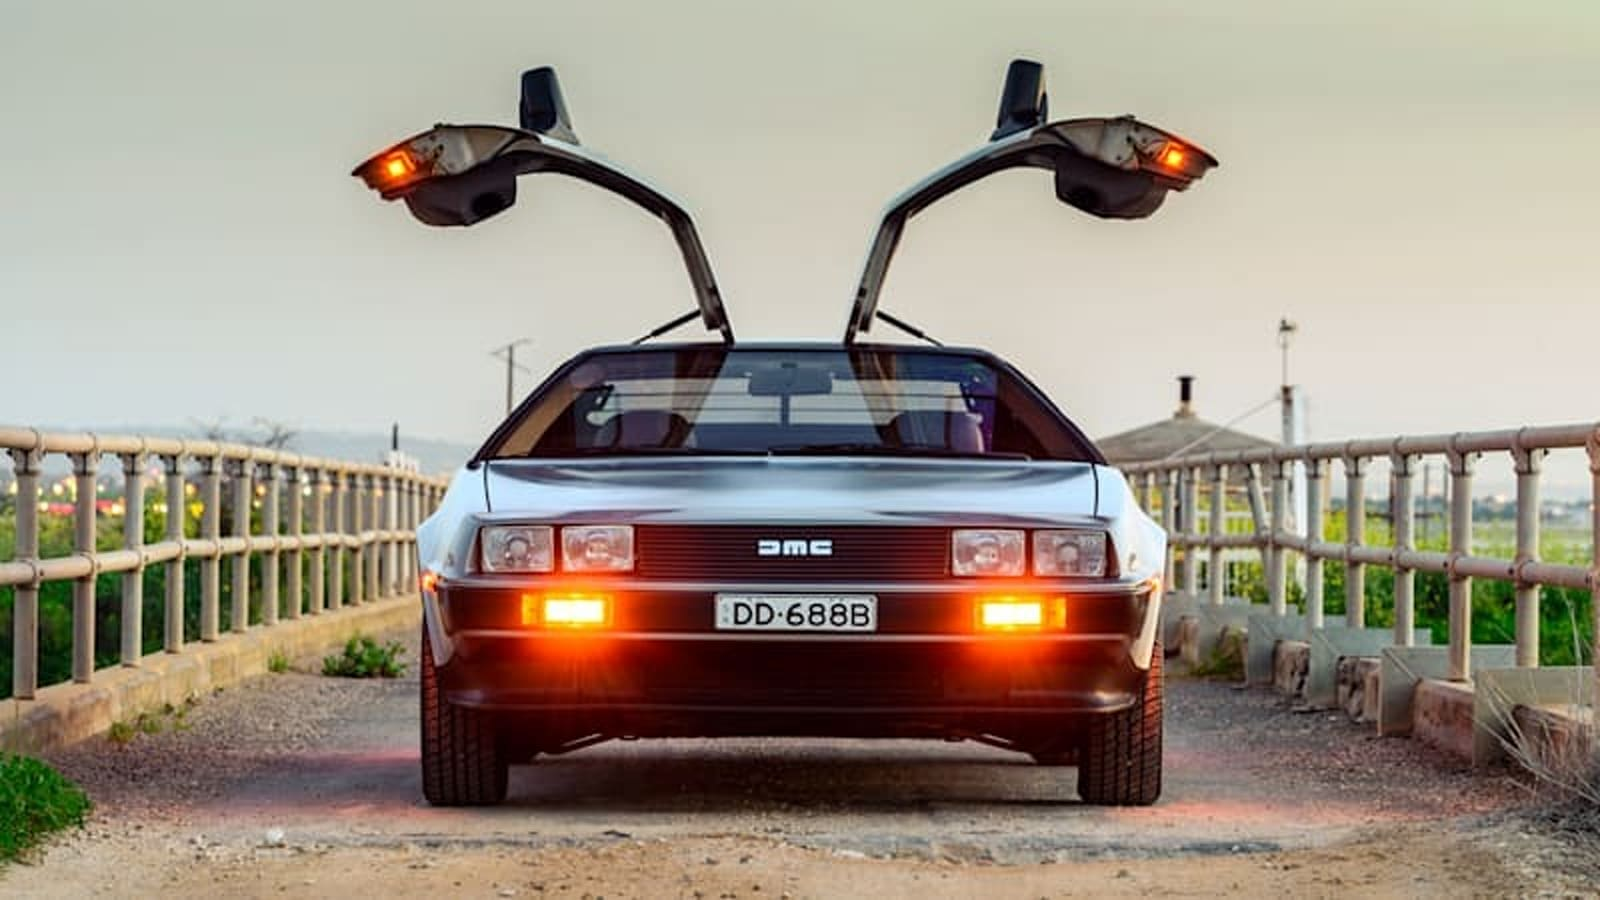 John DeLorean GM alternative background